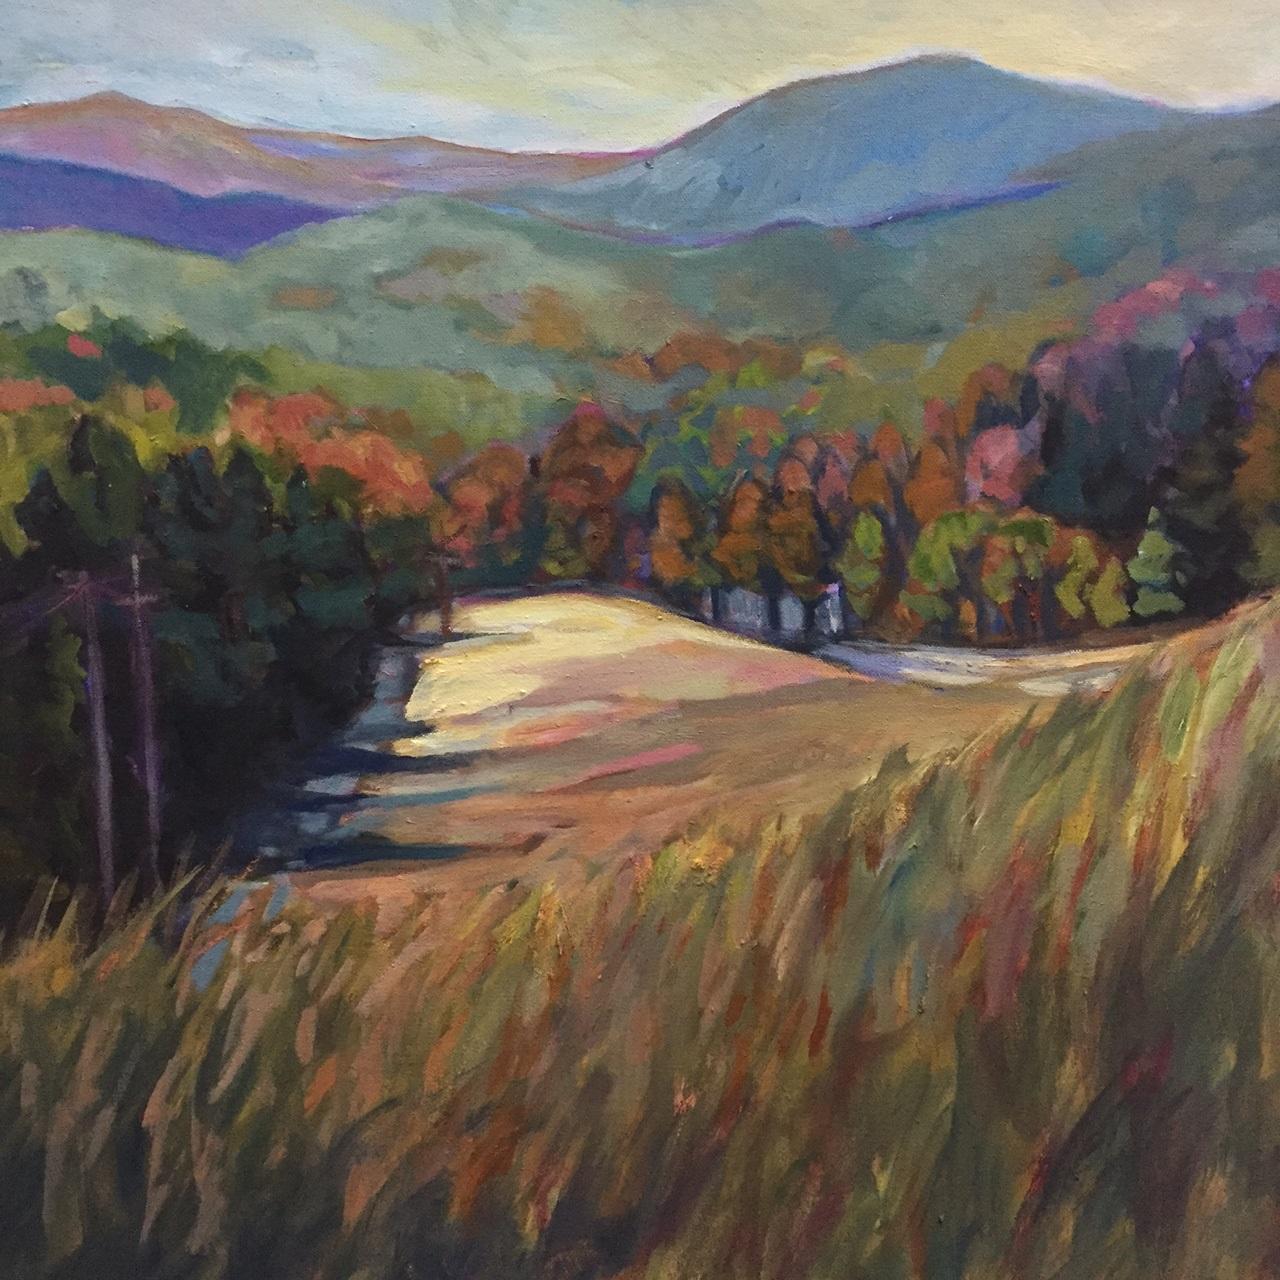 "Saluda Valley 30"" x 30"" oil on canvas"